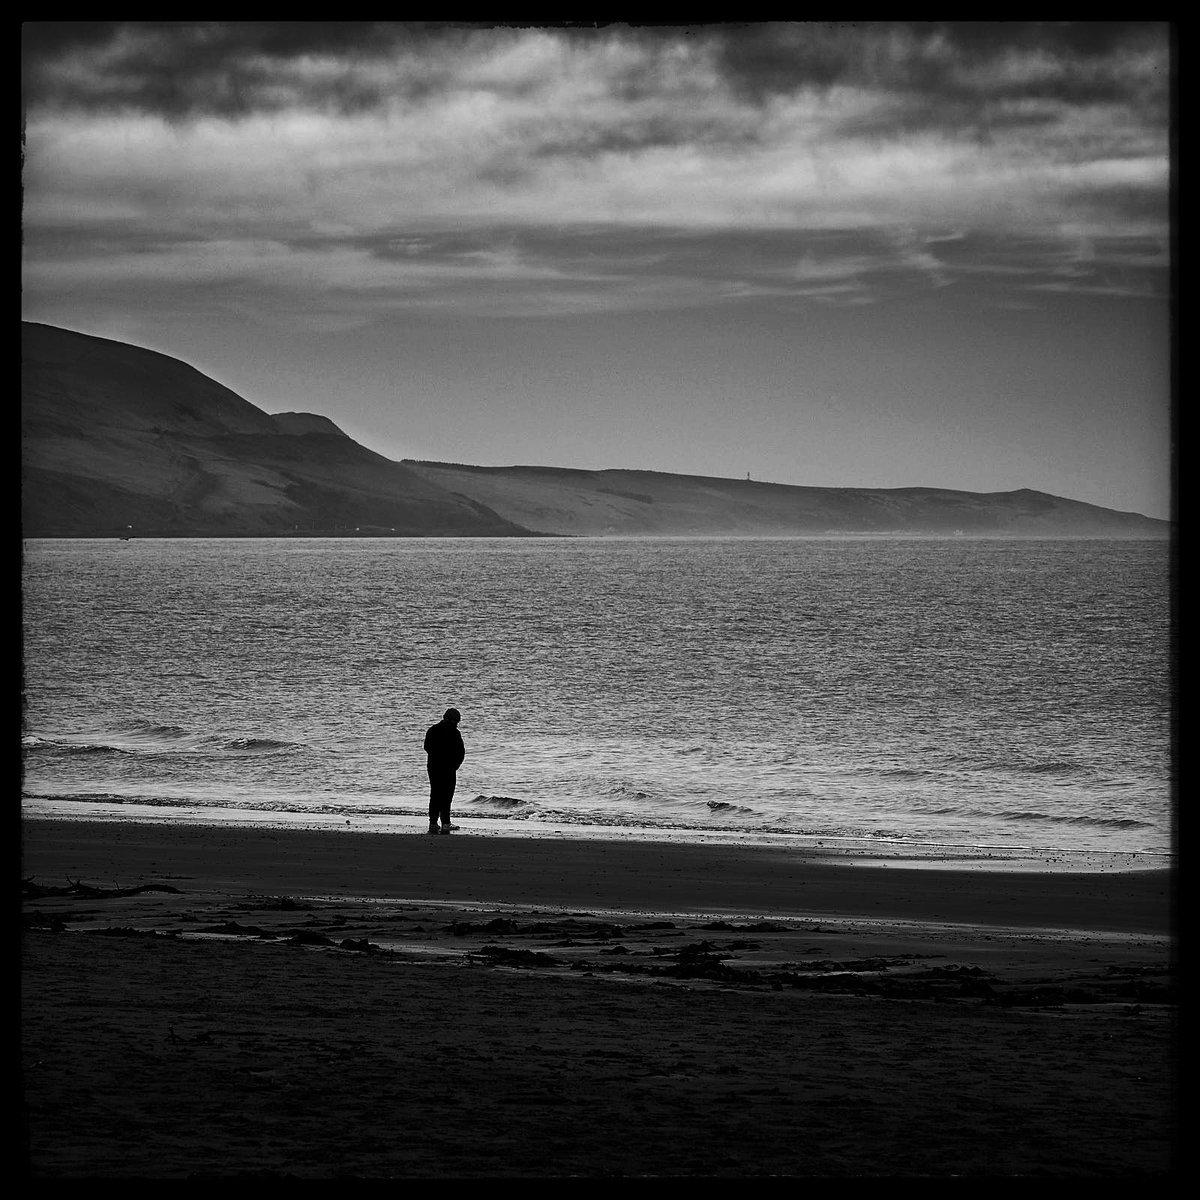 Girvan  . #beach #bnwphotography #fineartphotography #PhotographyIsArt #PhotoArt #blackandwhite #photooftheday #bnw_captures #NaturePhotography  . . .